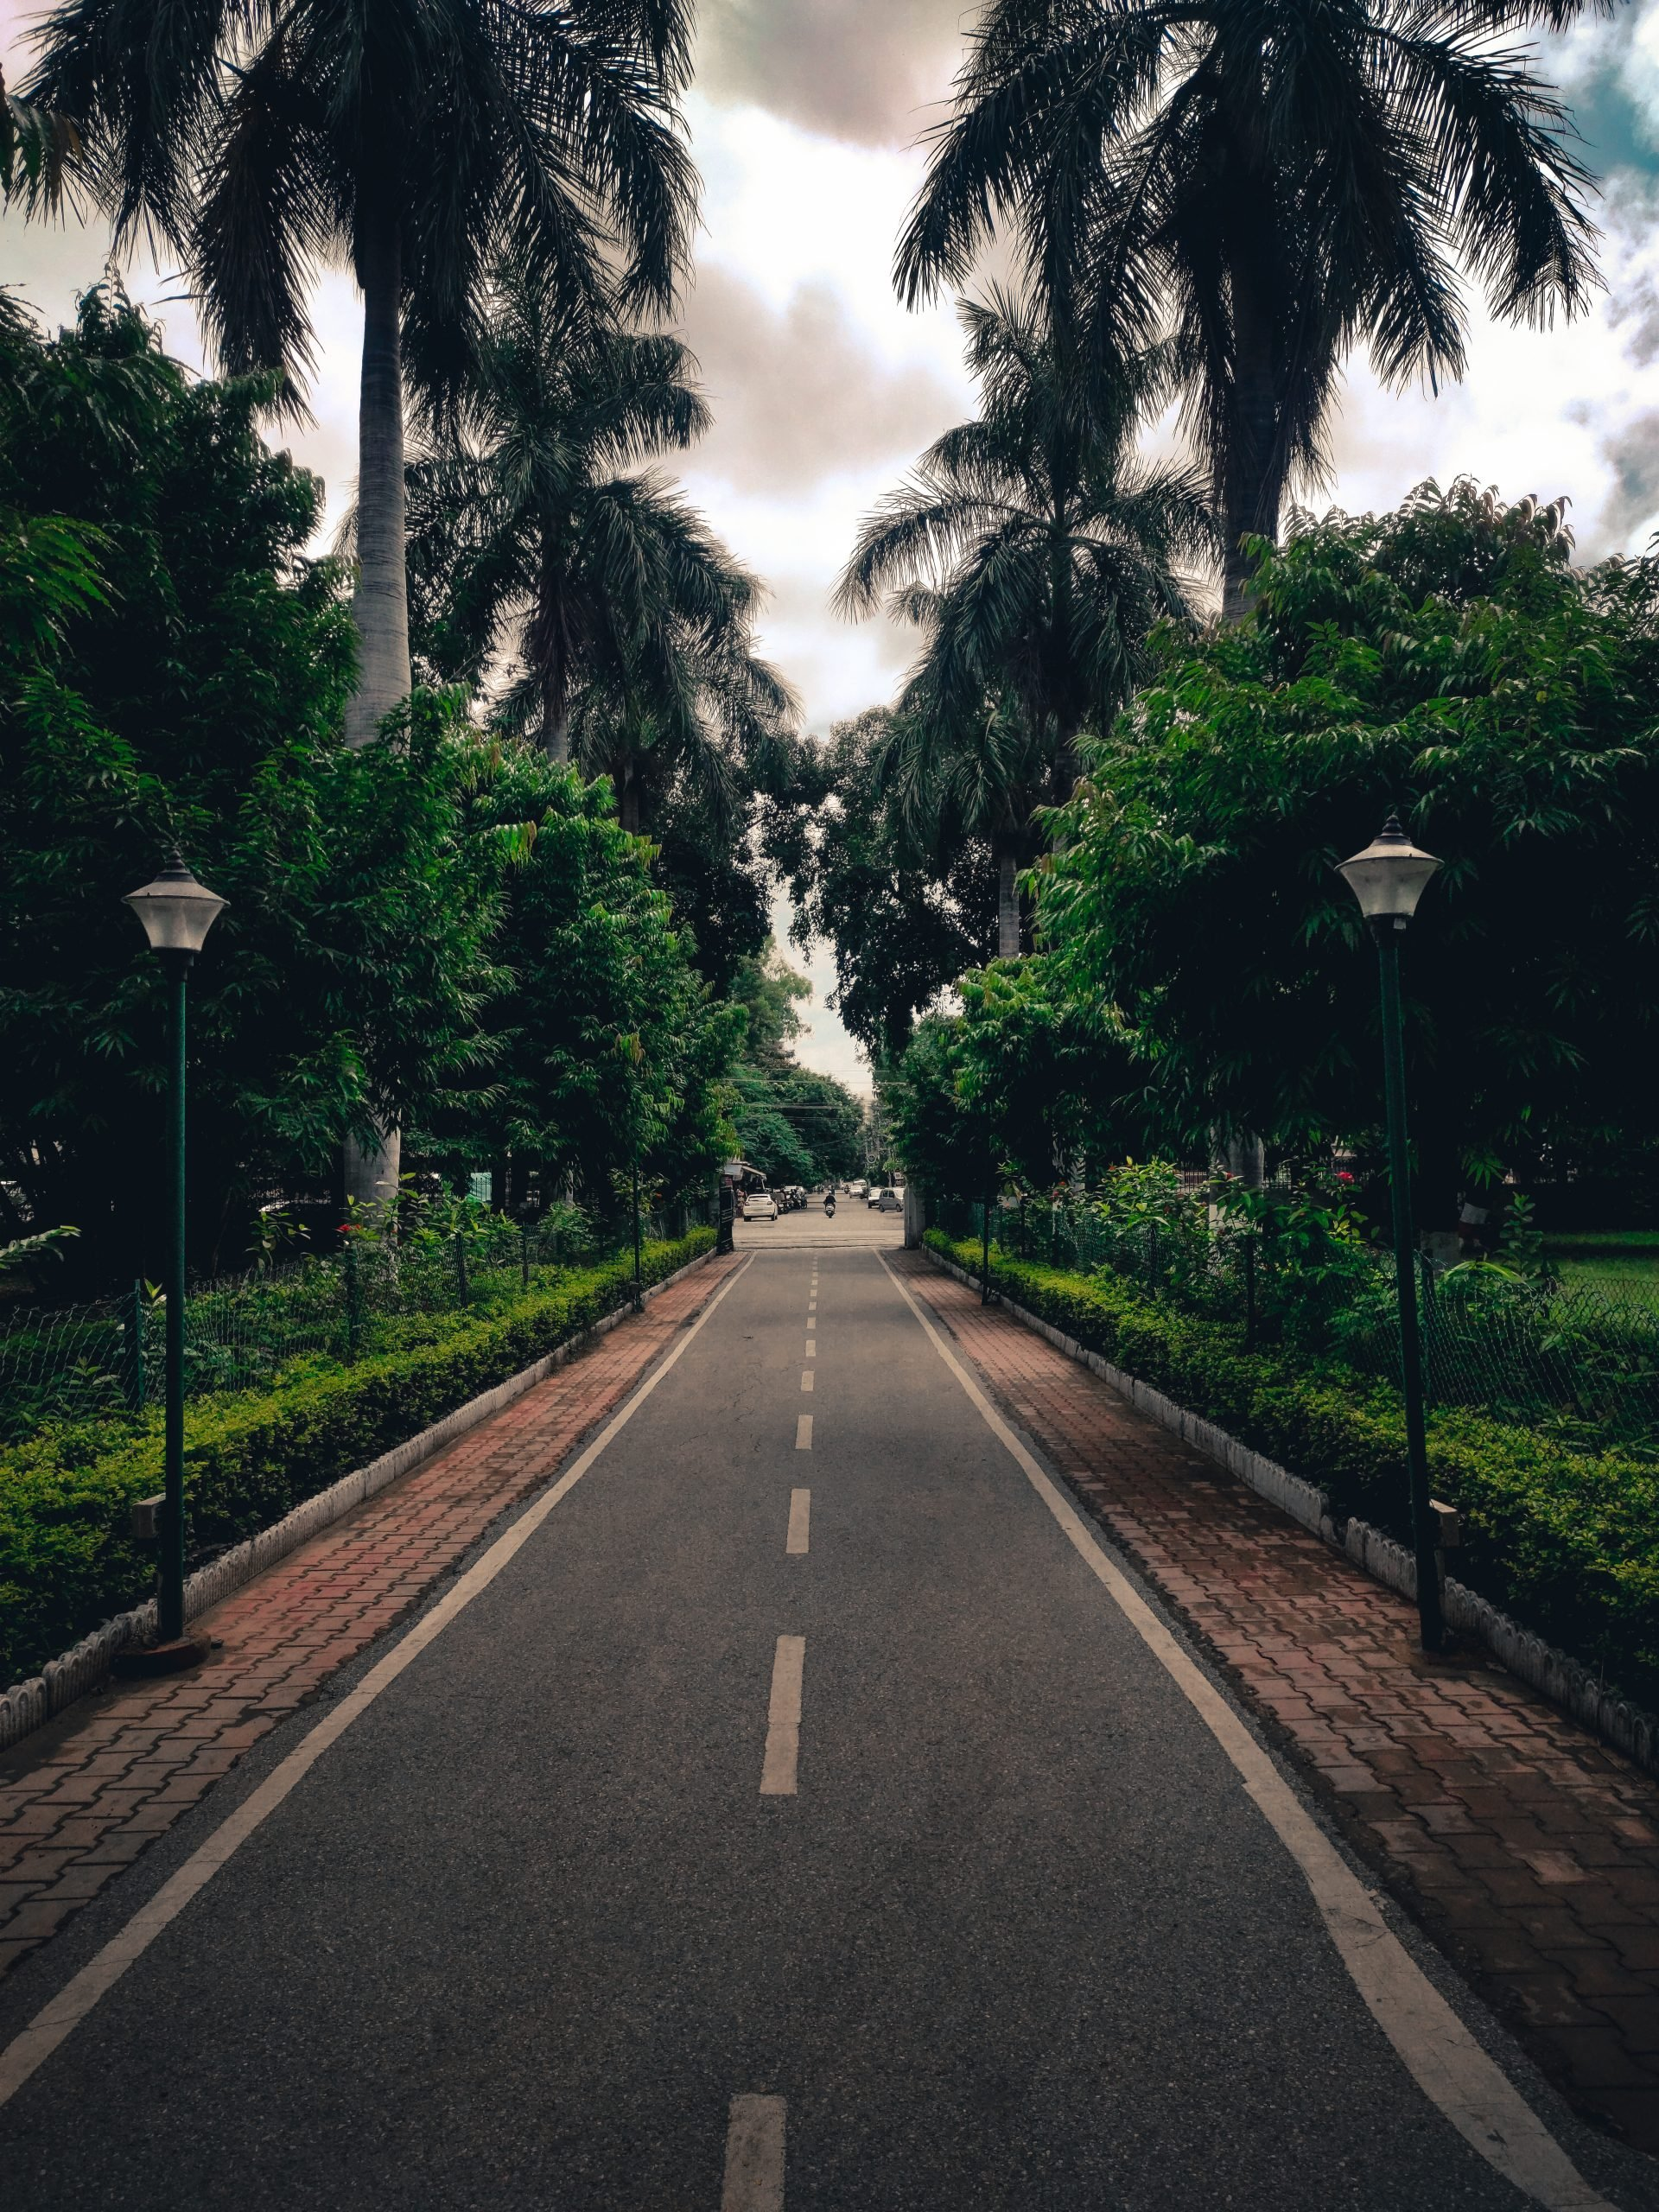 A Long Street Road